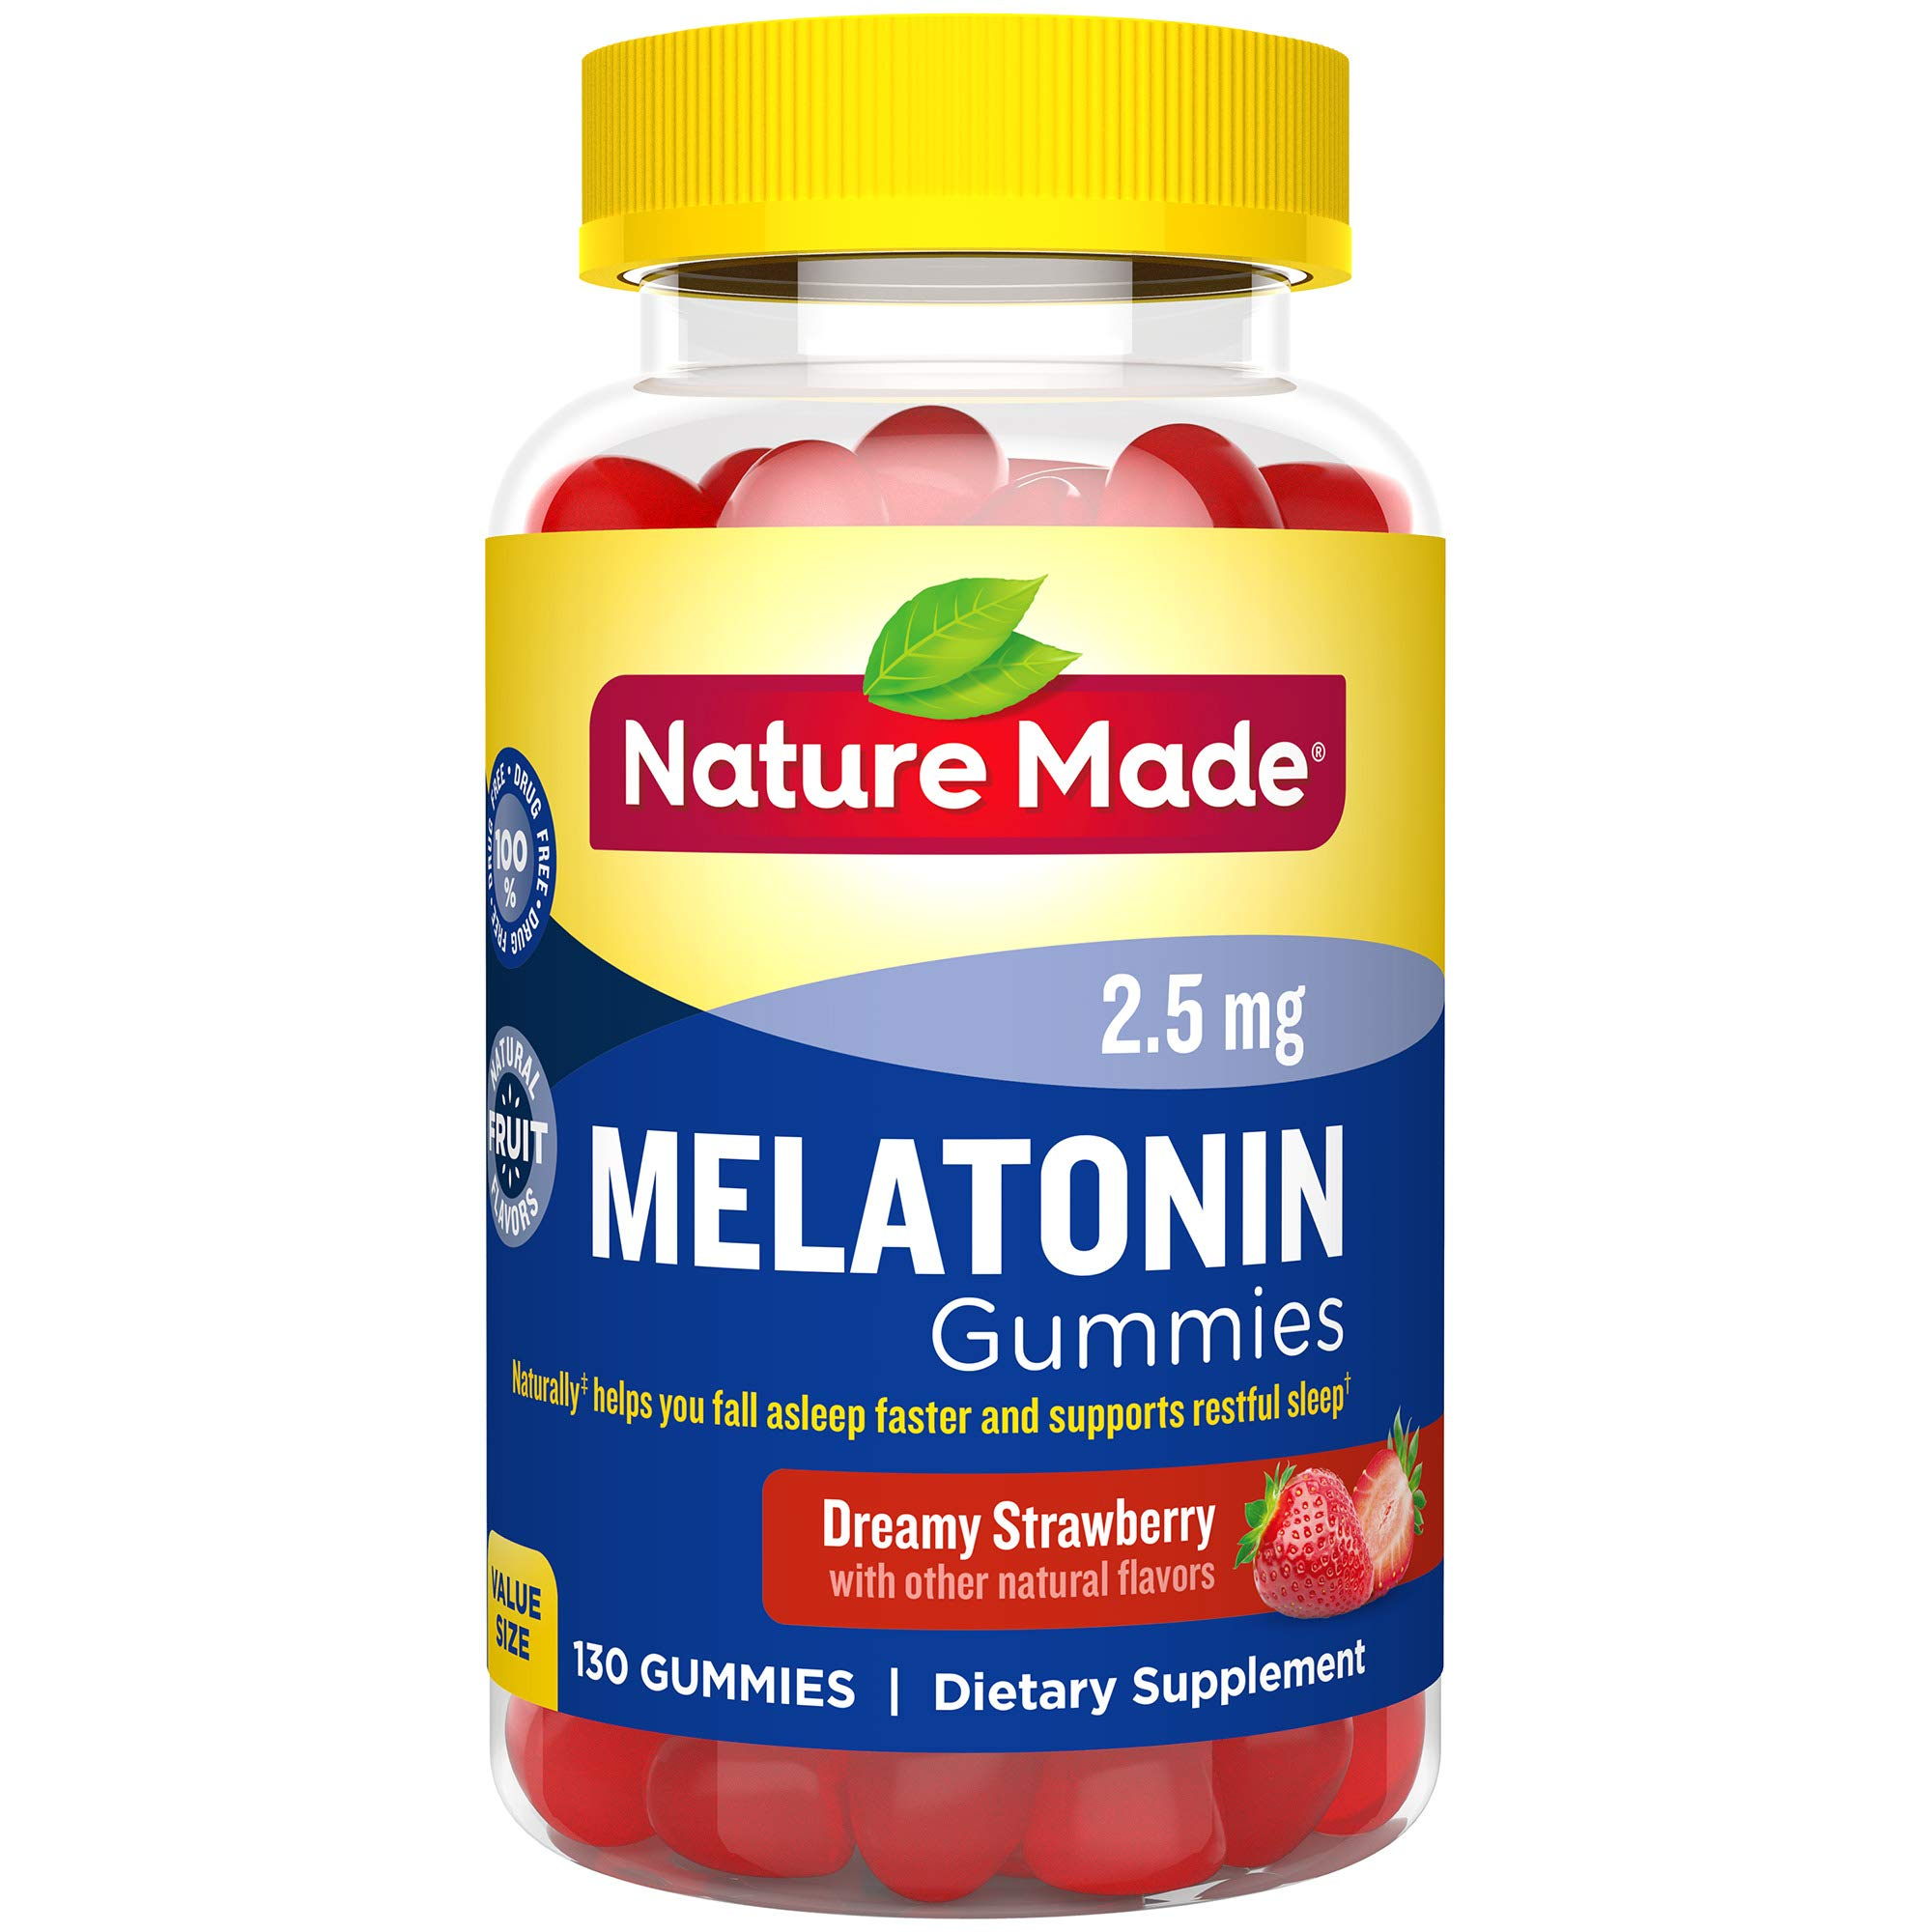 Nature Made Melatonin 2.5 mg. Adult Gummies Value Size 130 Ct